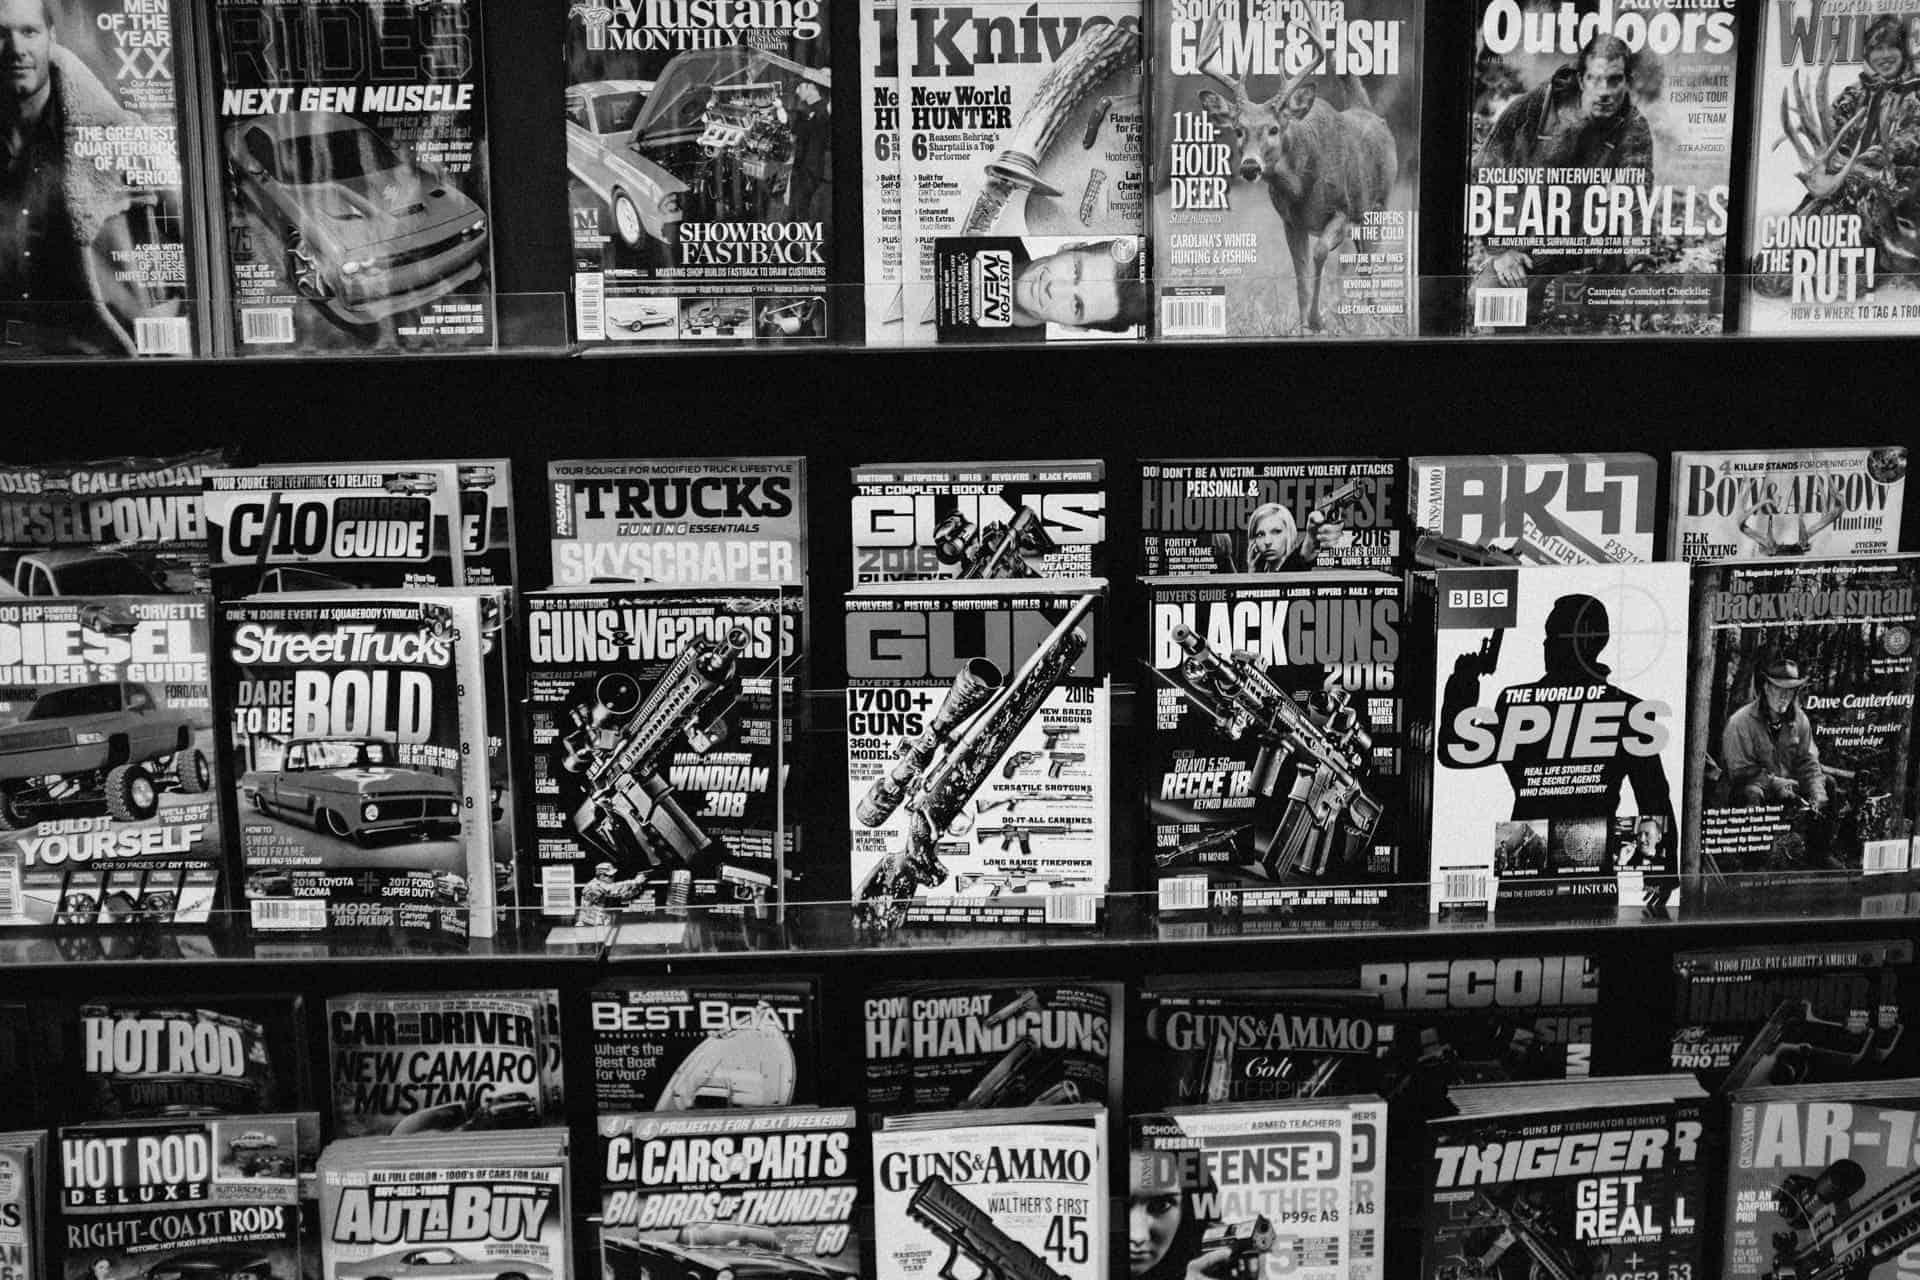 Gun magazine